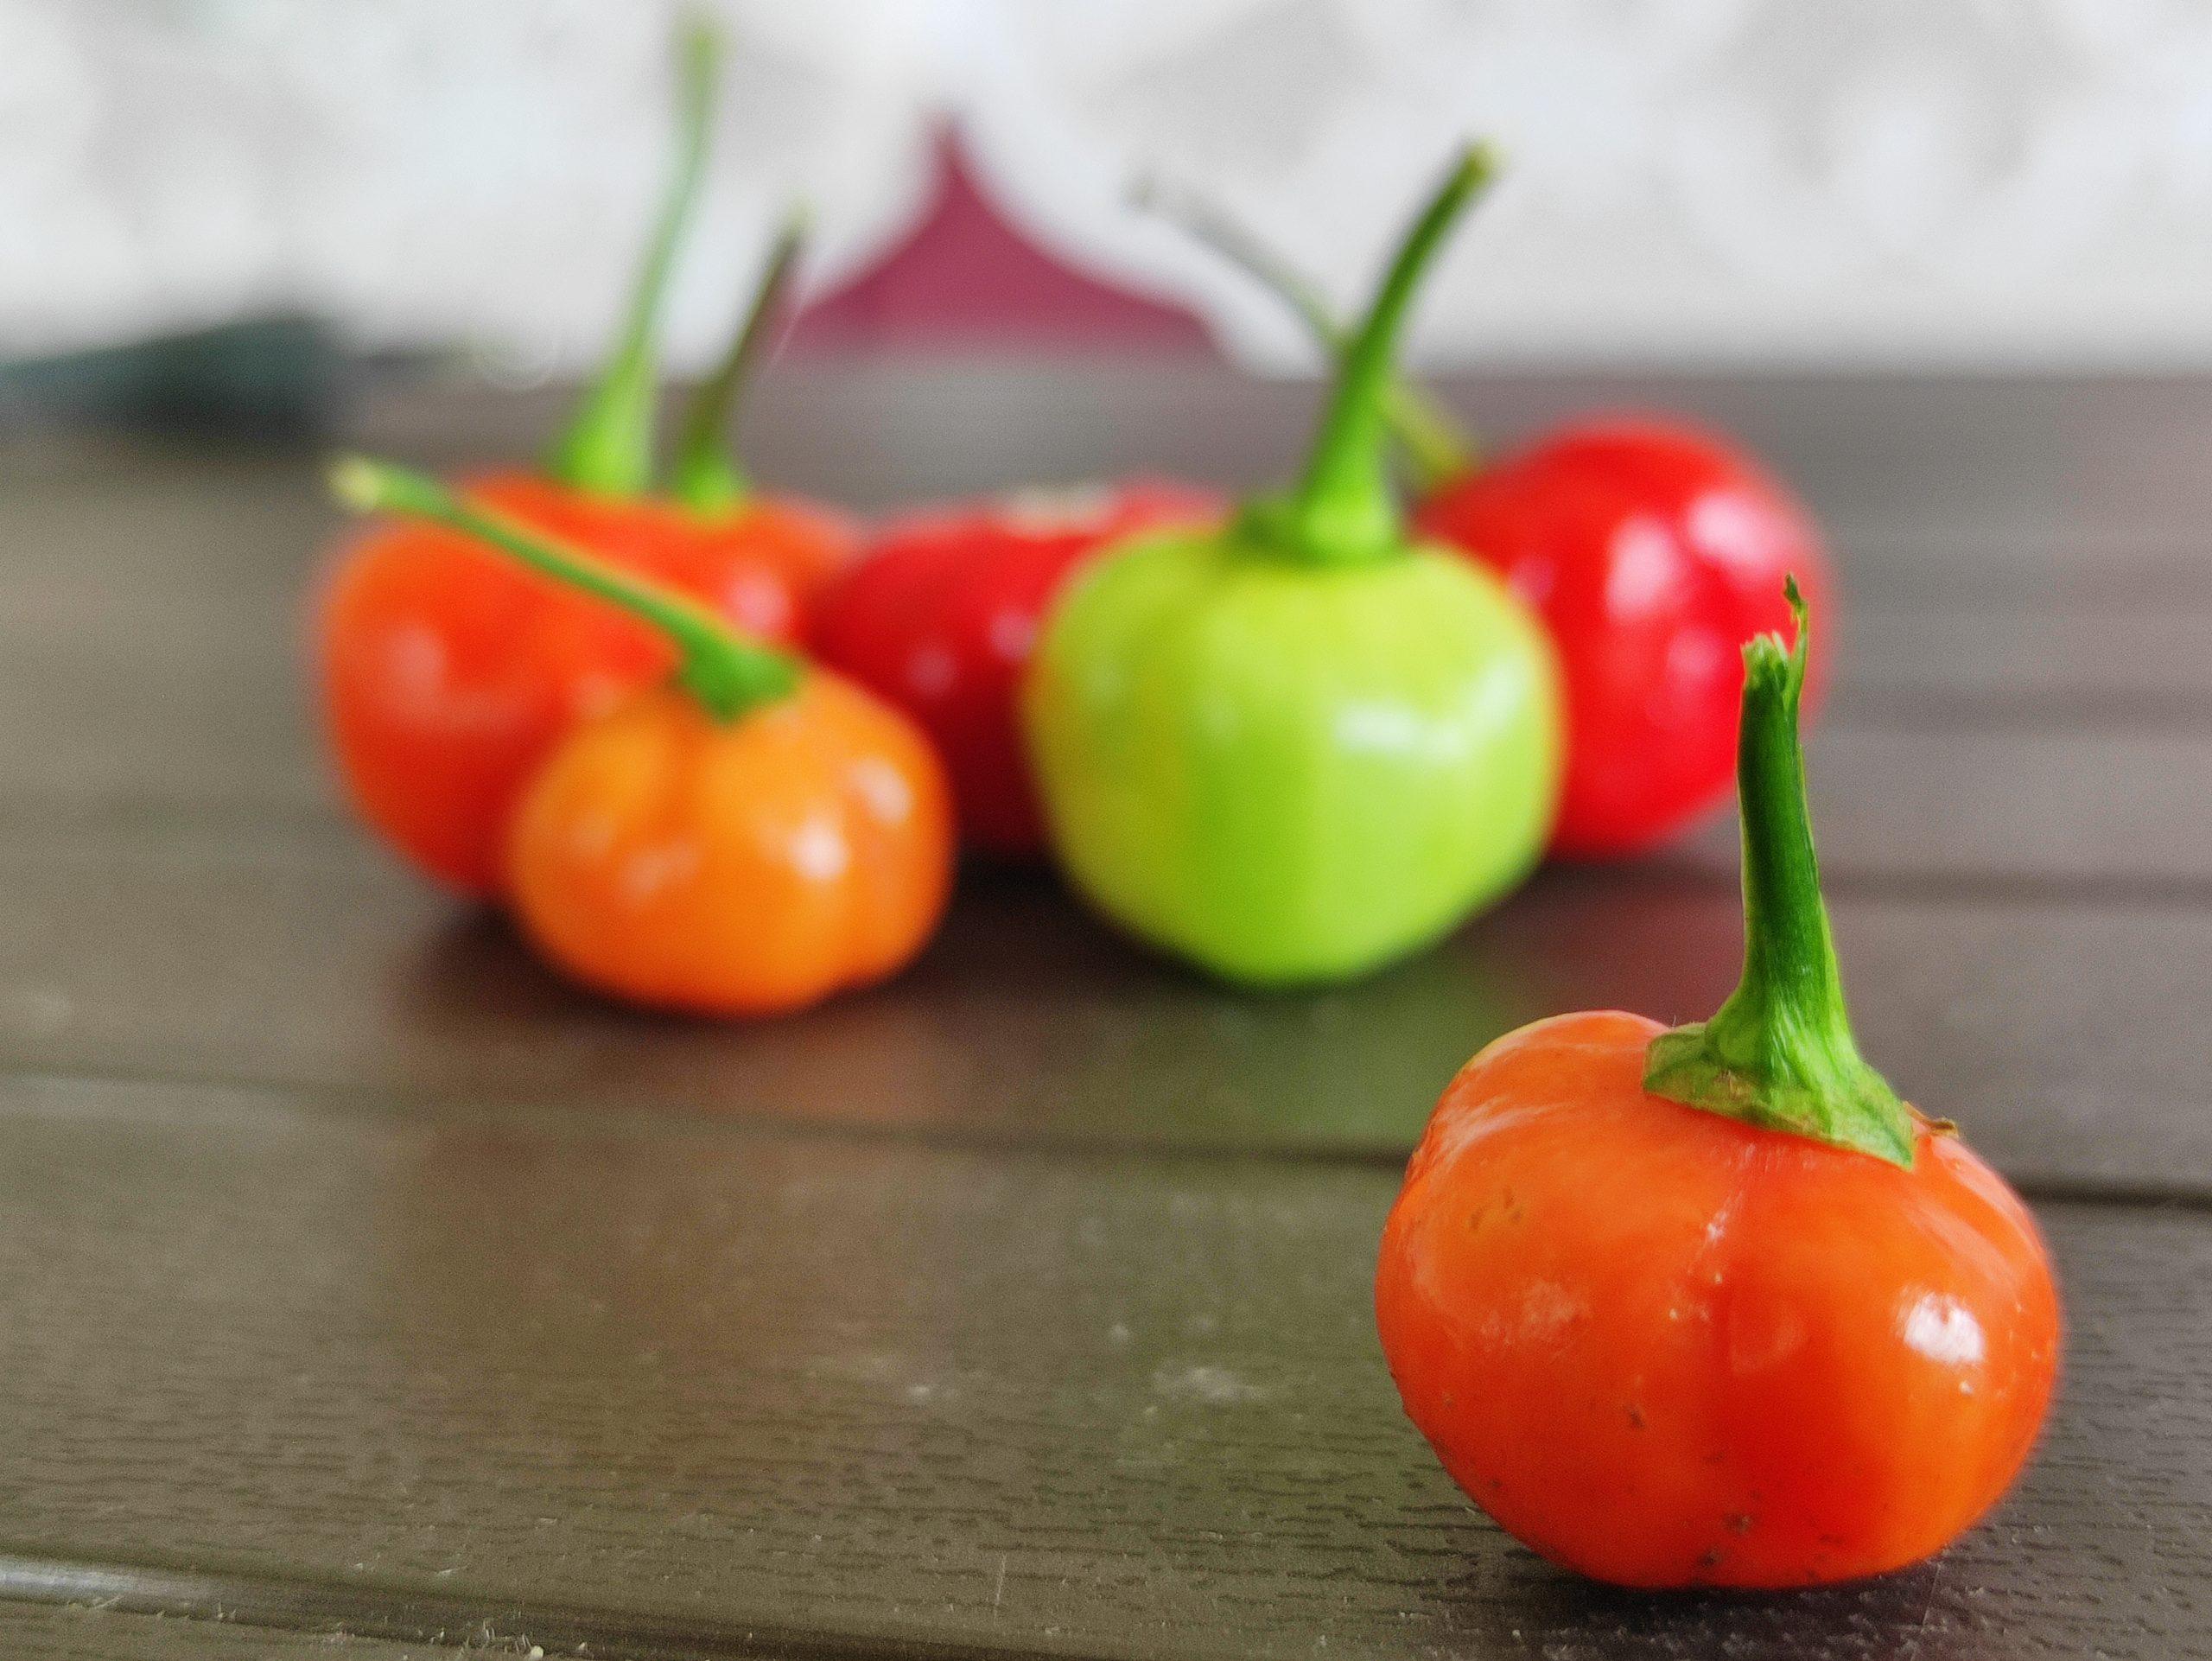 Chili Pepper on Focus